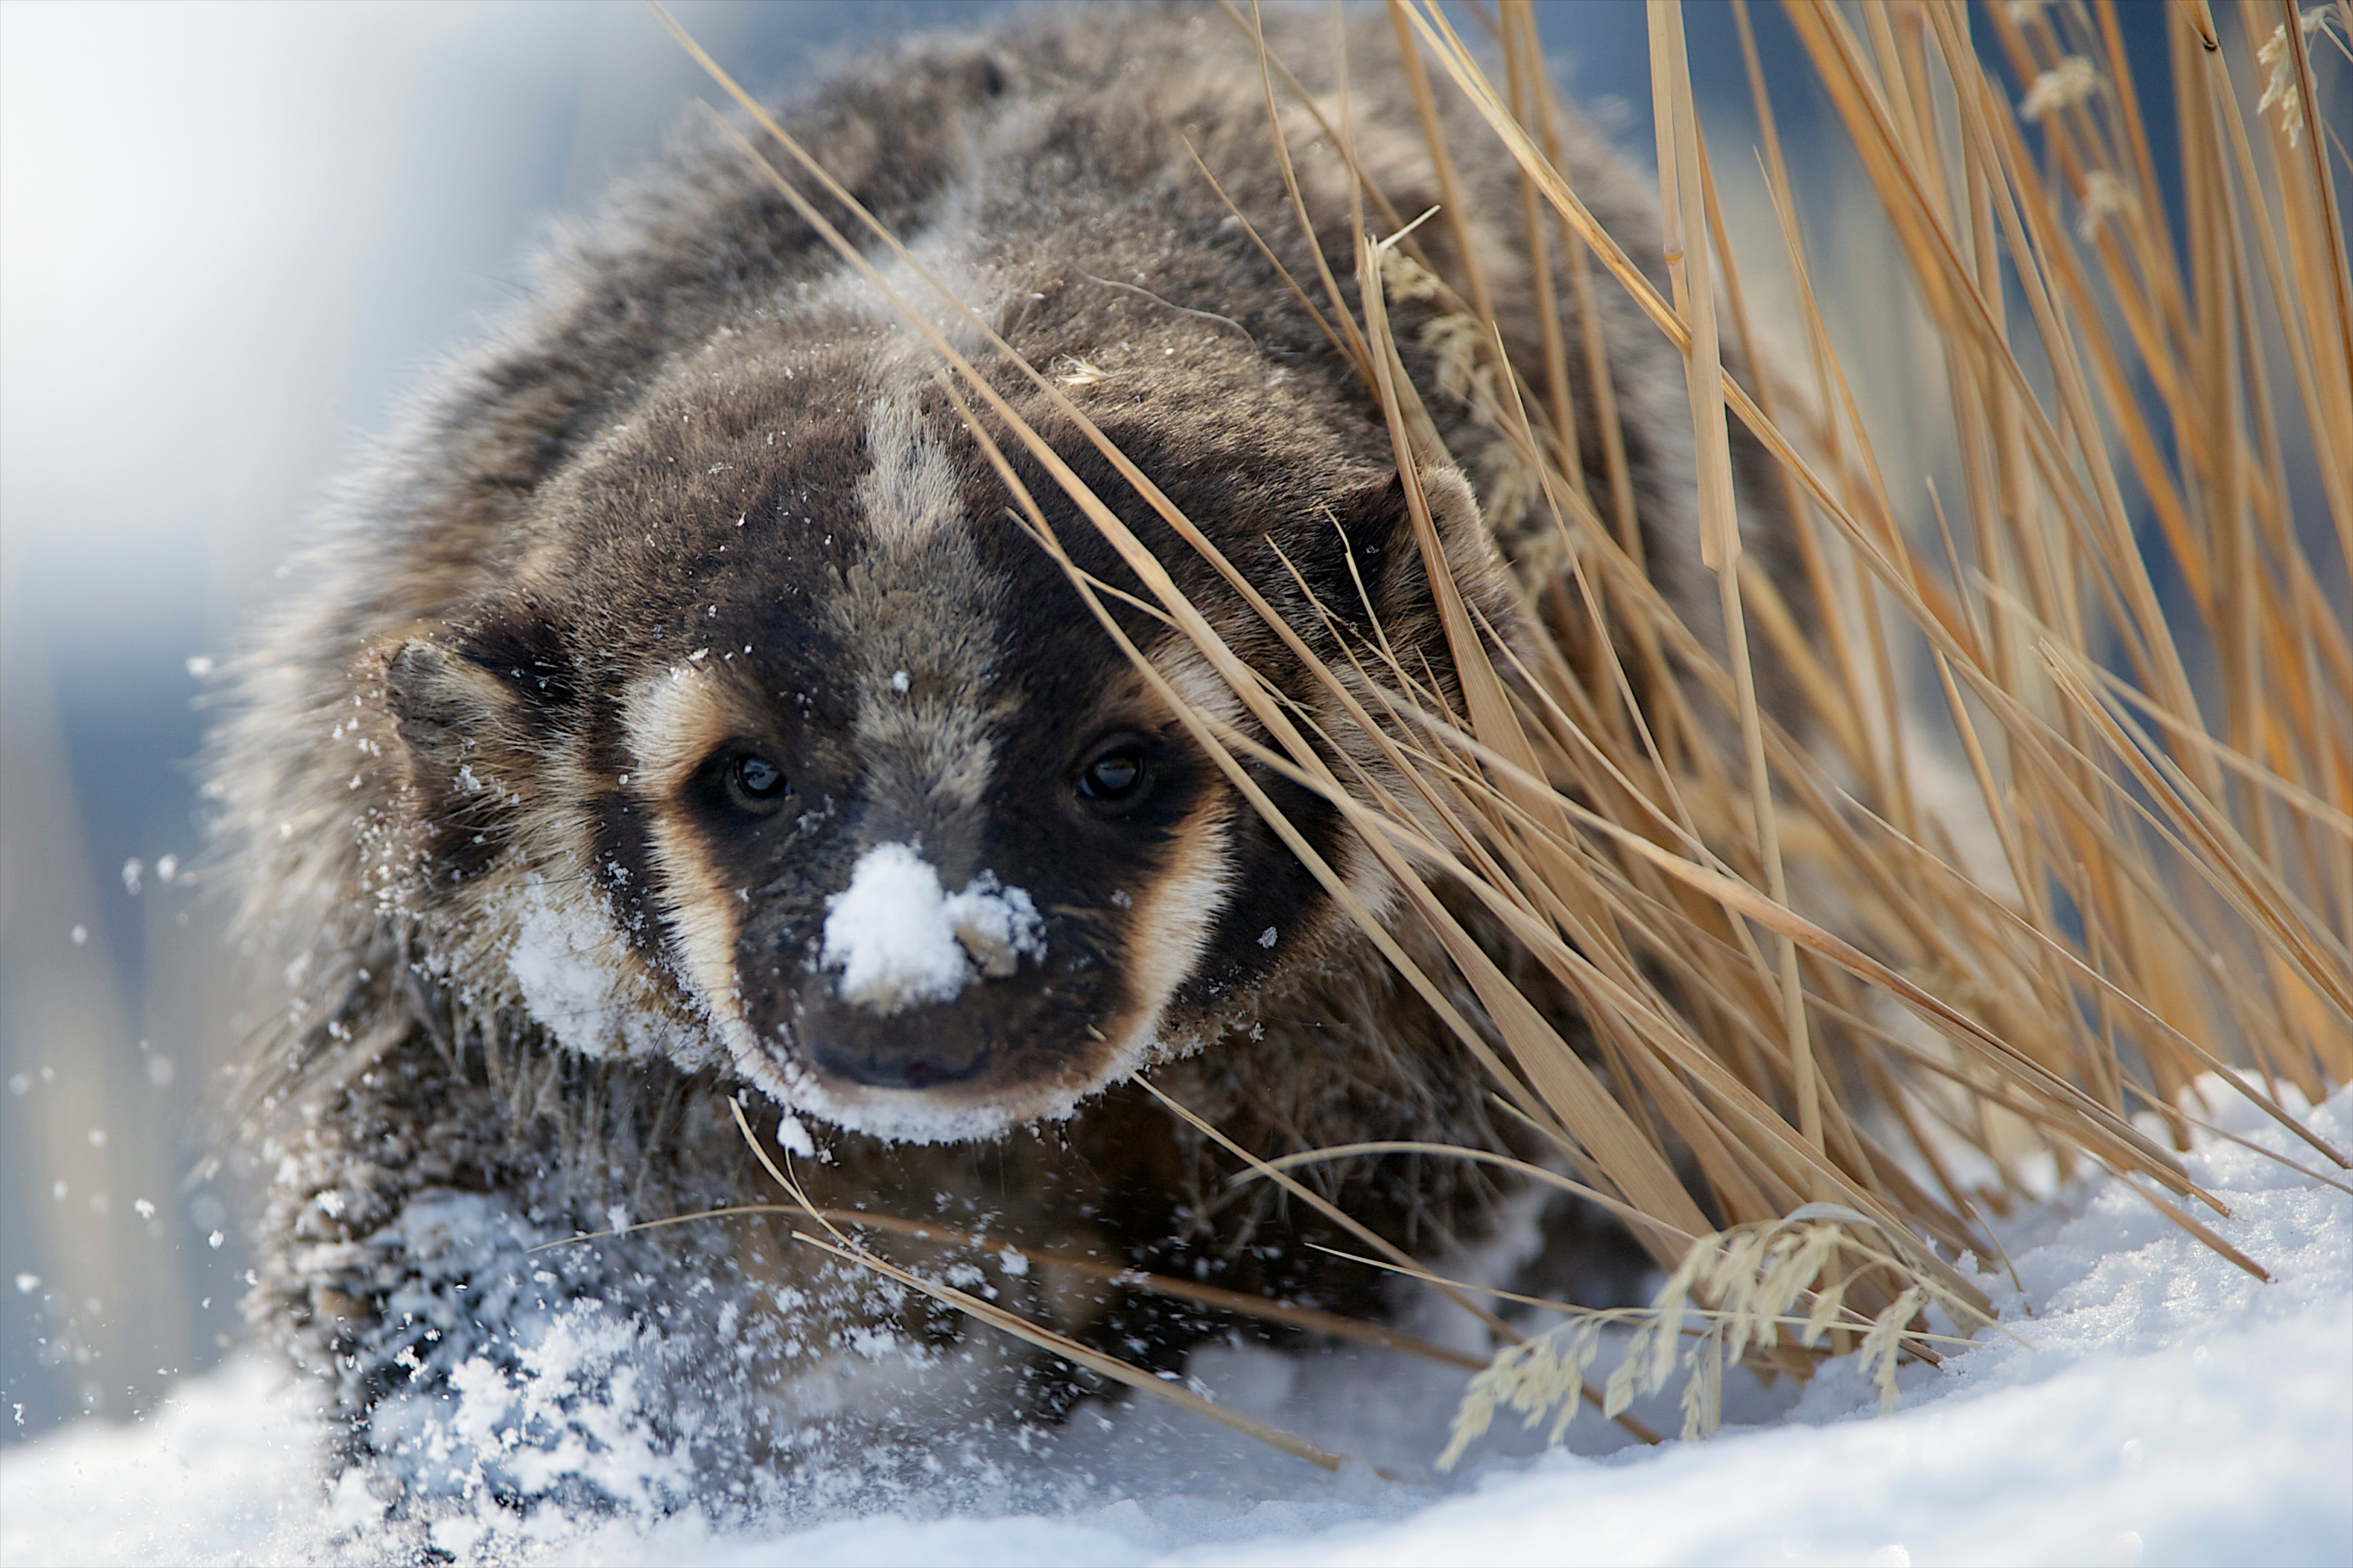 The week in wildlife in pictures in 2020 Wildlife